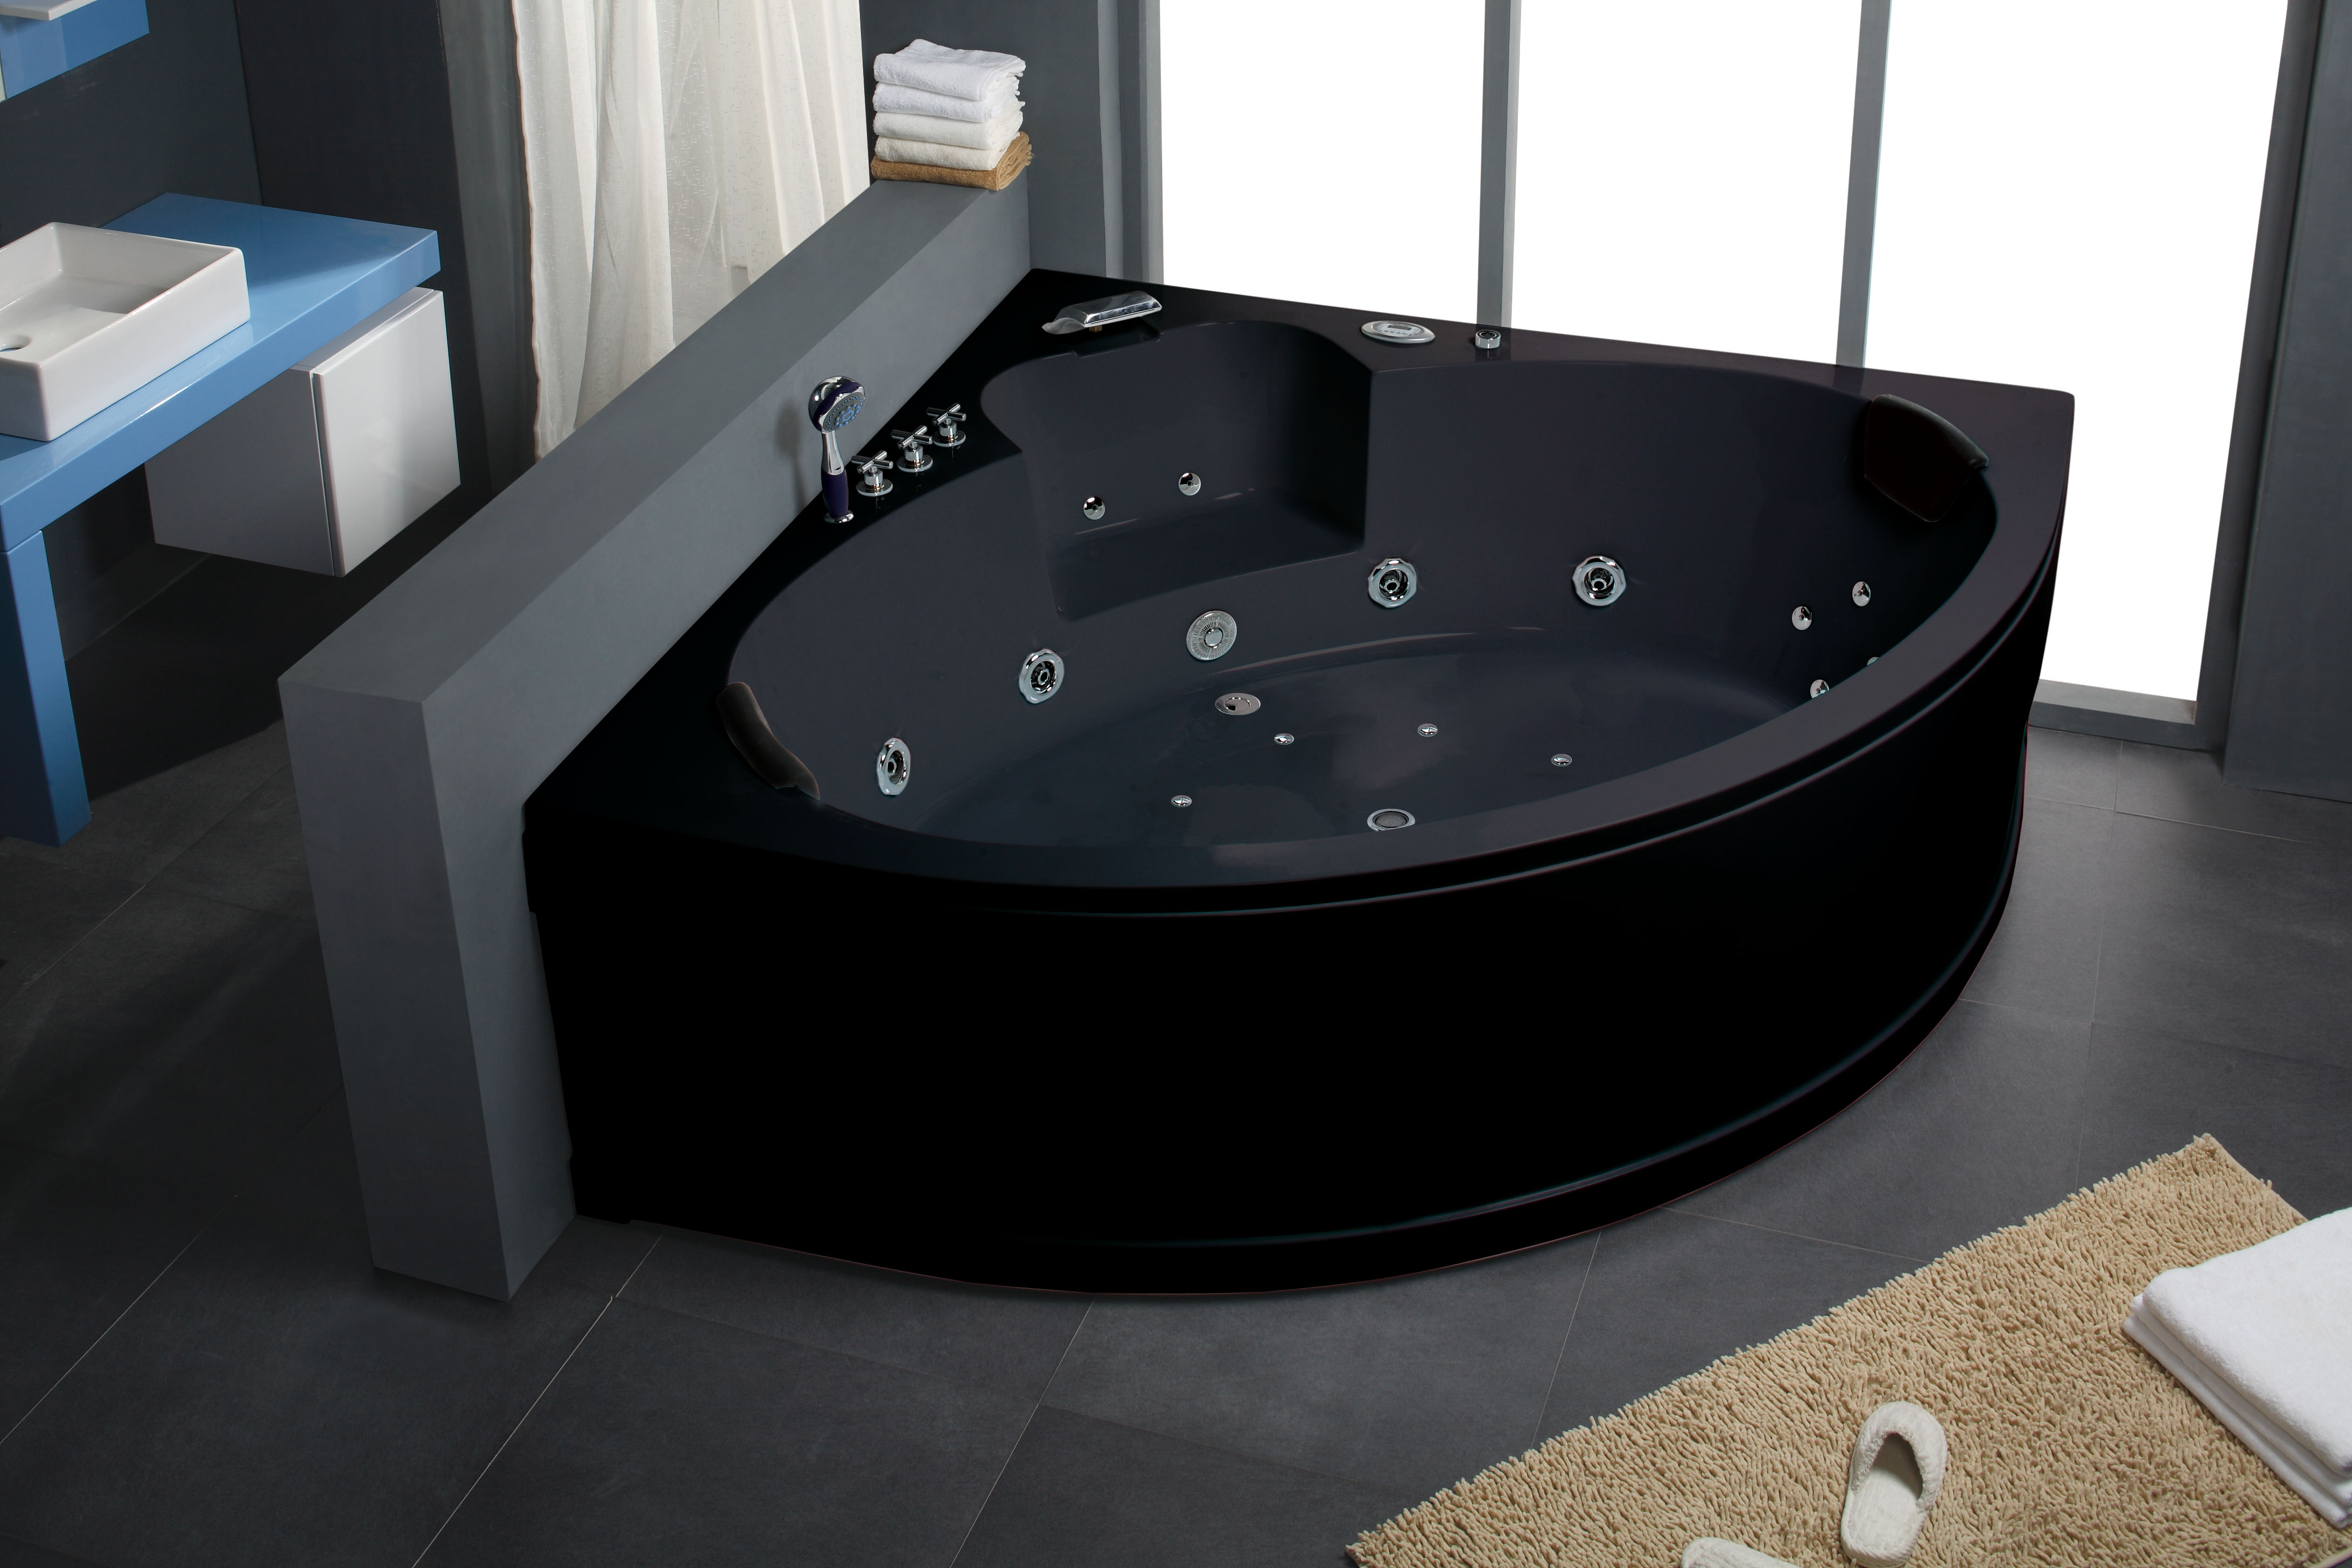 Indoor Corner Freestanding Bathtub Hydro Jets Black